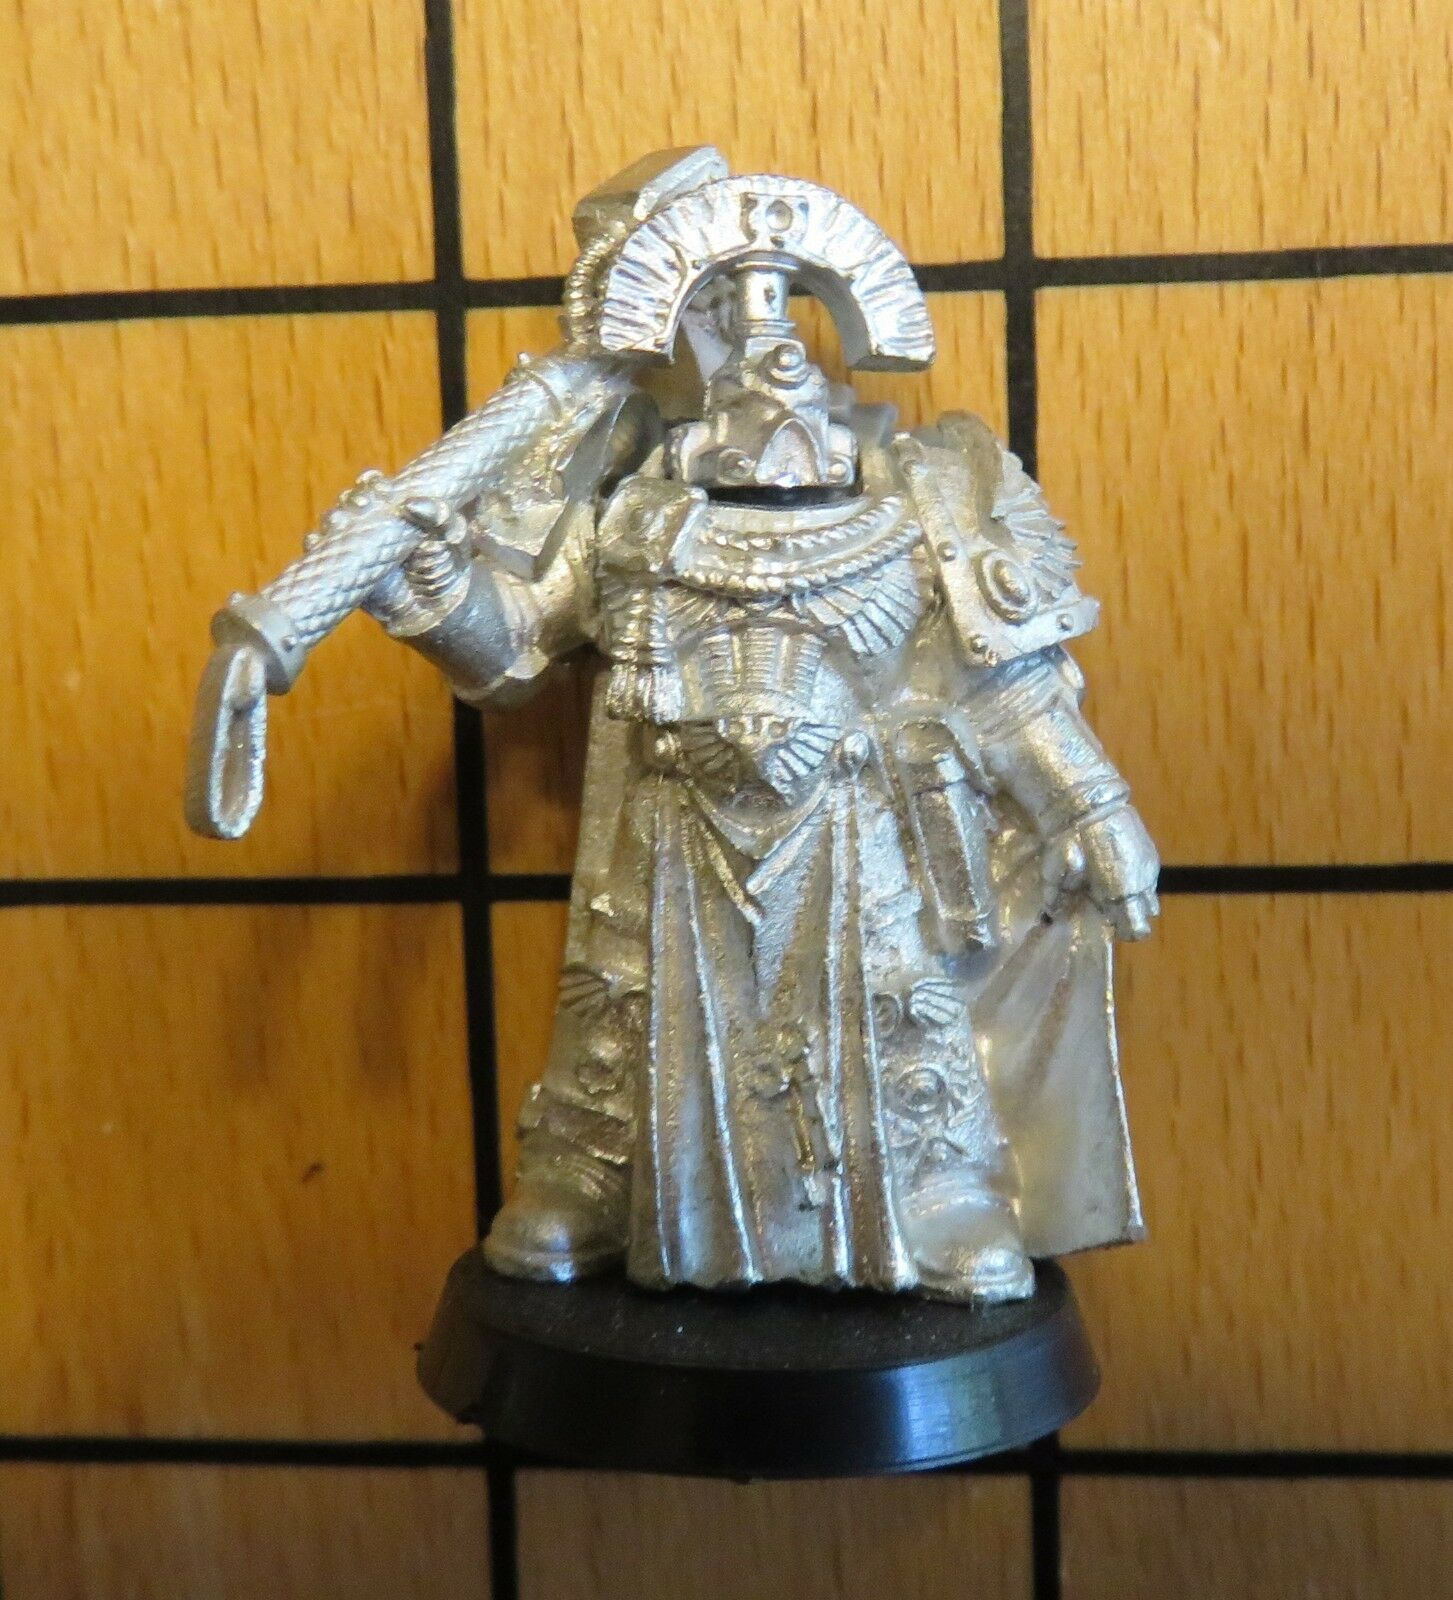 40k Rare oop Vintage Metal Space Marine Veteran Veteran Veteran Captain w Power Hammer Maul b31724